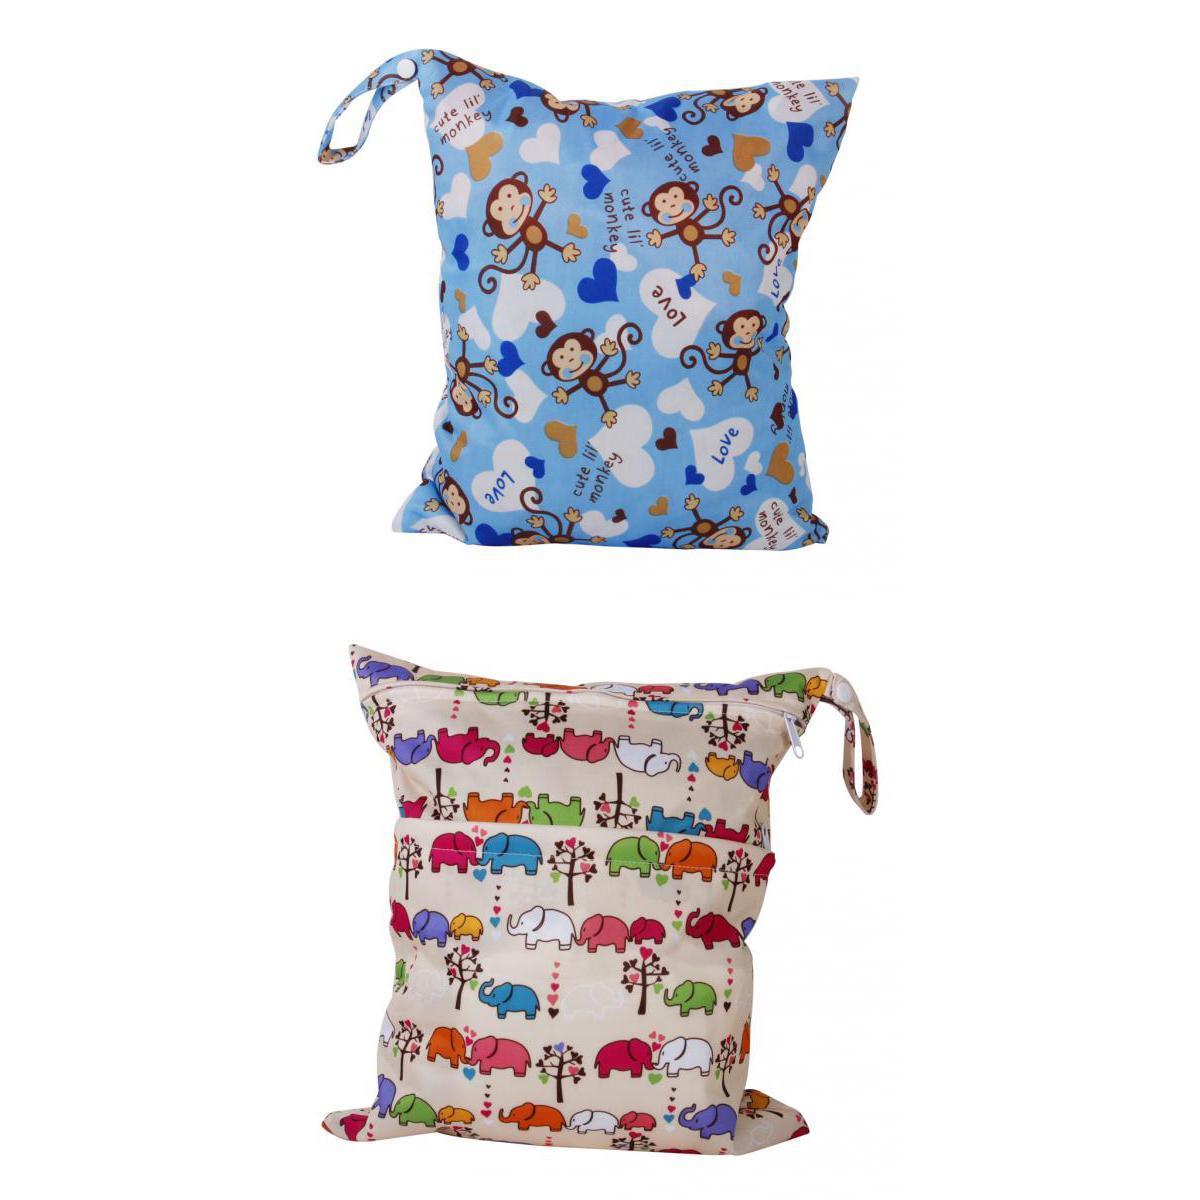 2 Zipper Diaper Nappy Wet Dry Bag Reusable Swim Travel Tote 2Pocket Animal Print